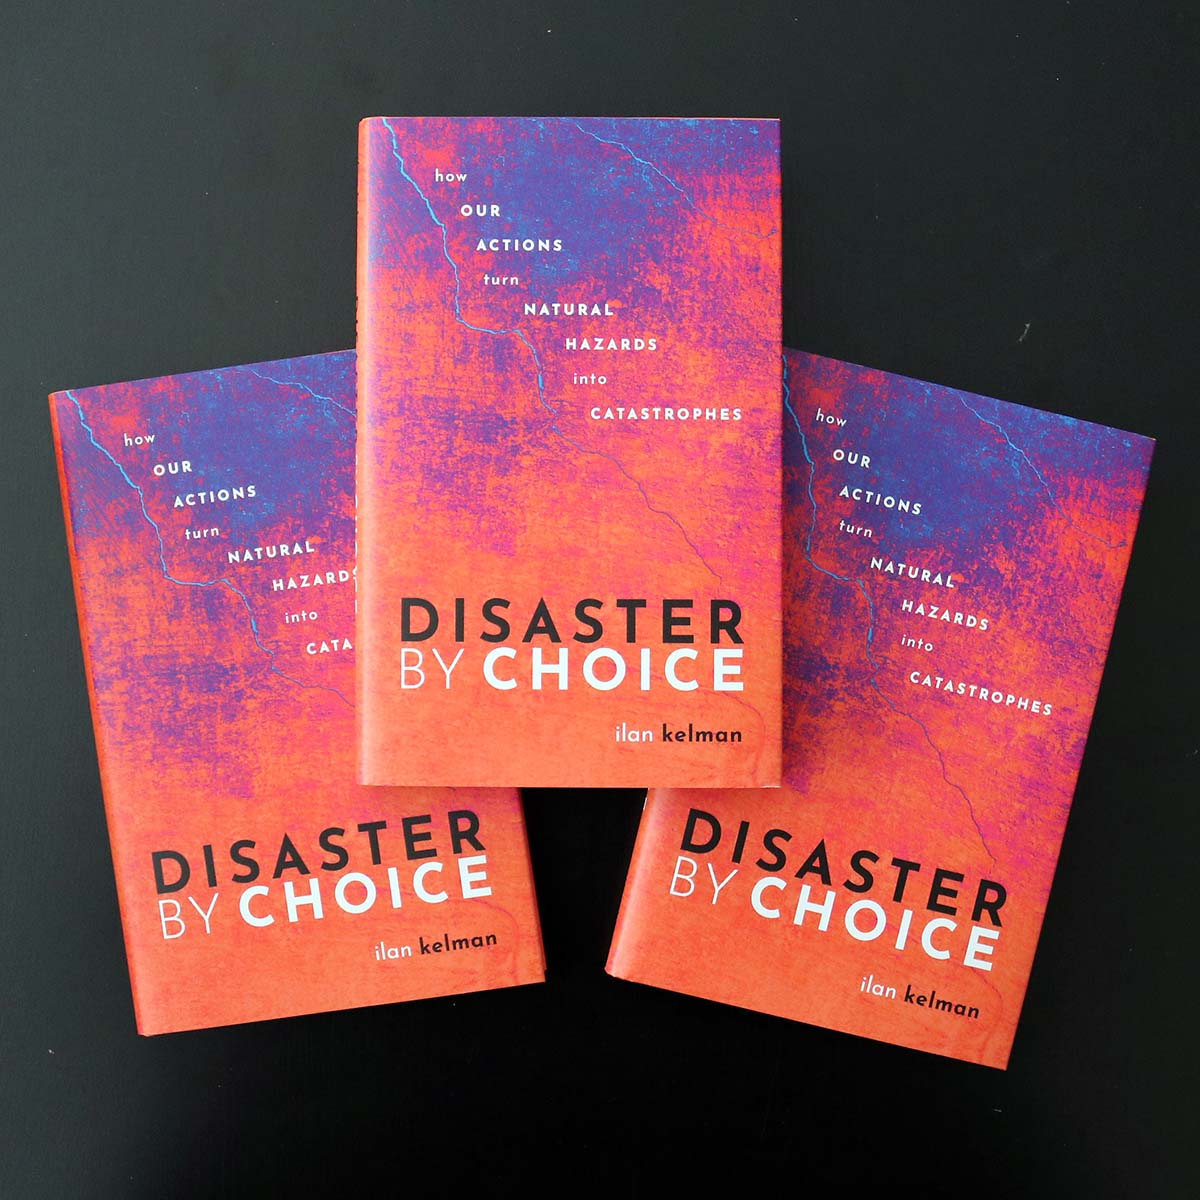 "Ilan Kelman on Twitter: """"Disaster By Choice"" https://t.co ..."